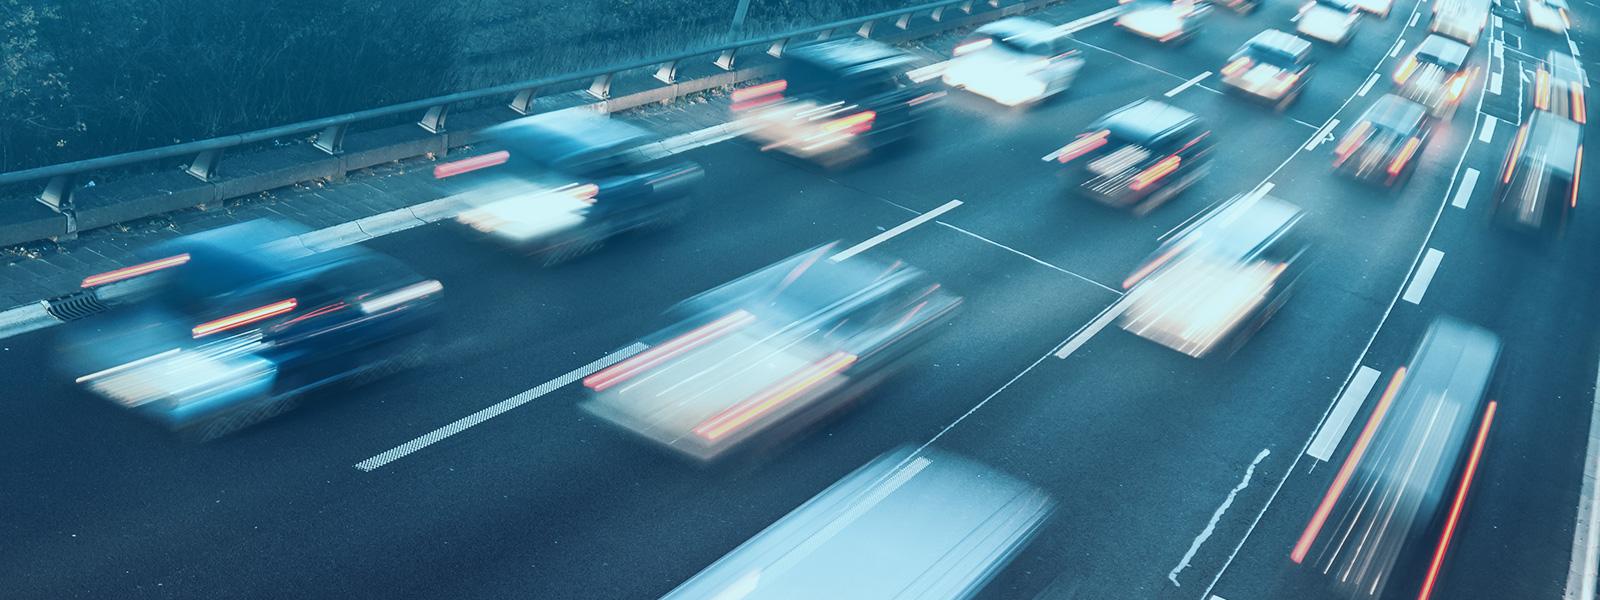 campanha-mostra-motoristas-desatentos-video-blog-ceabs